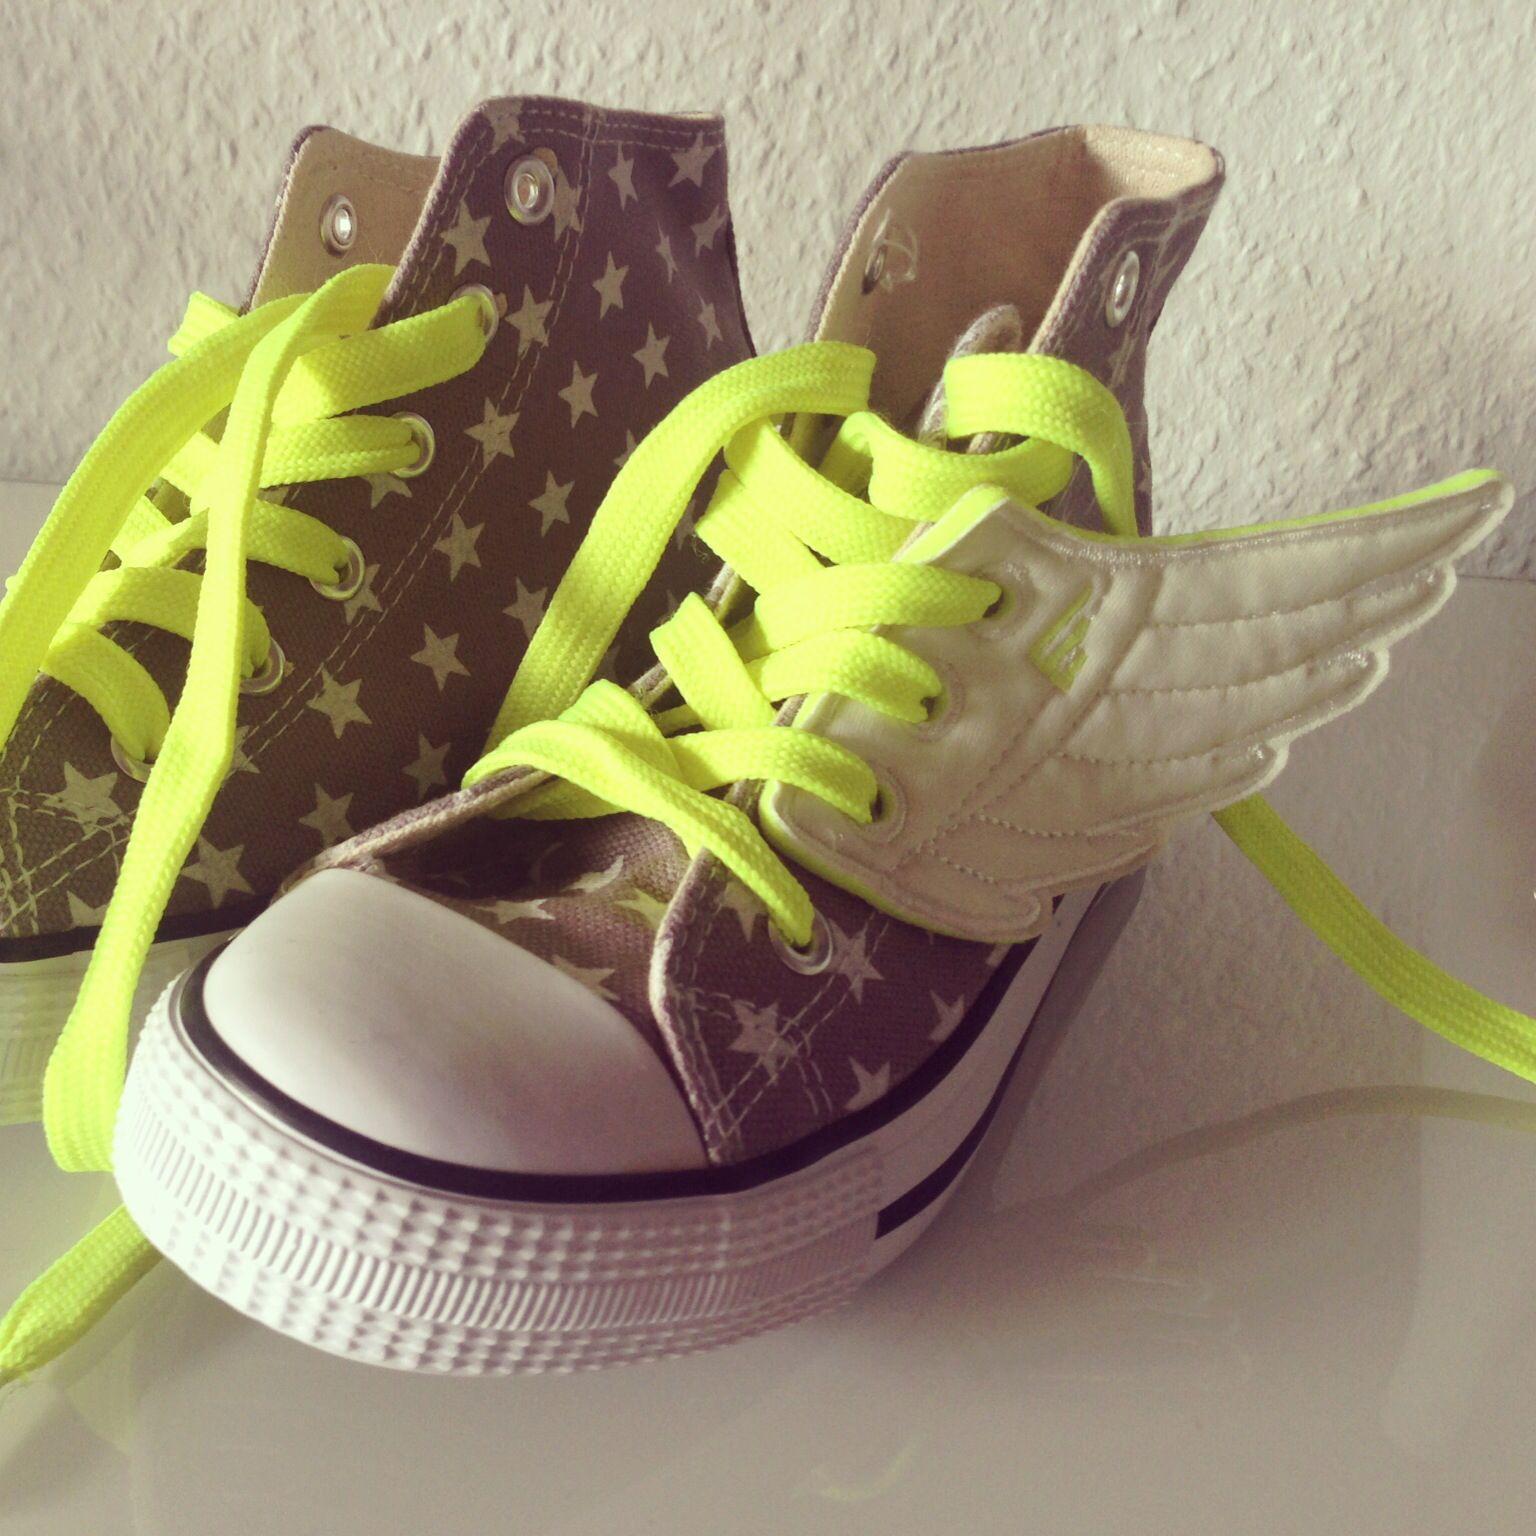 Kinder-Sneaker haben Flügel und passende Schnürsenkel in neon bekommen / sneaker for Kids with wings and neon laces